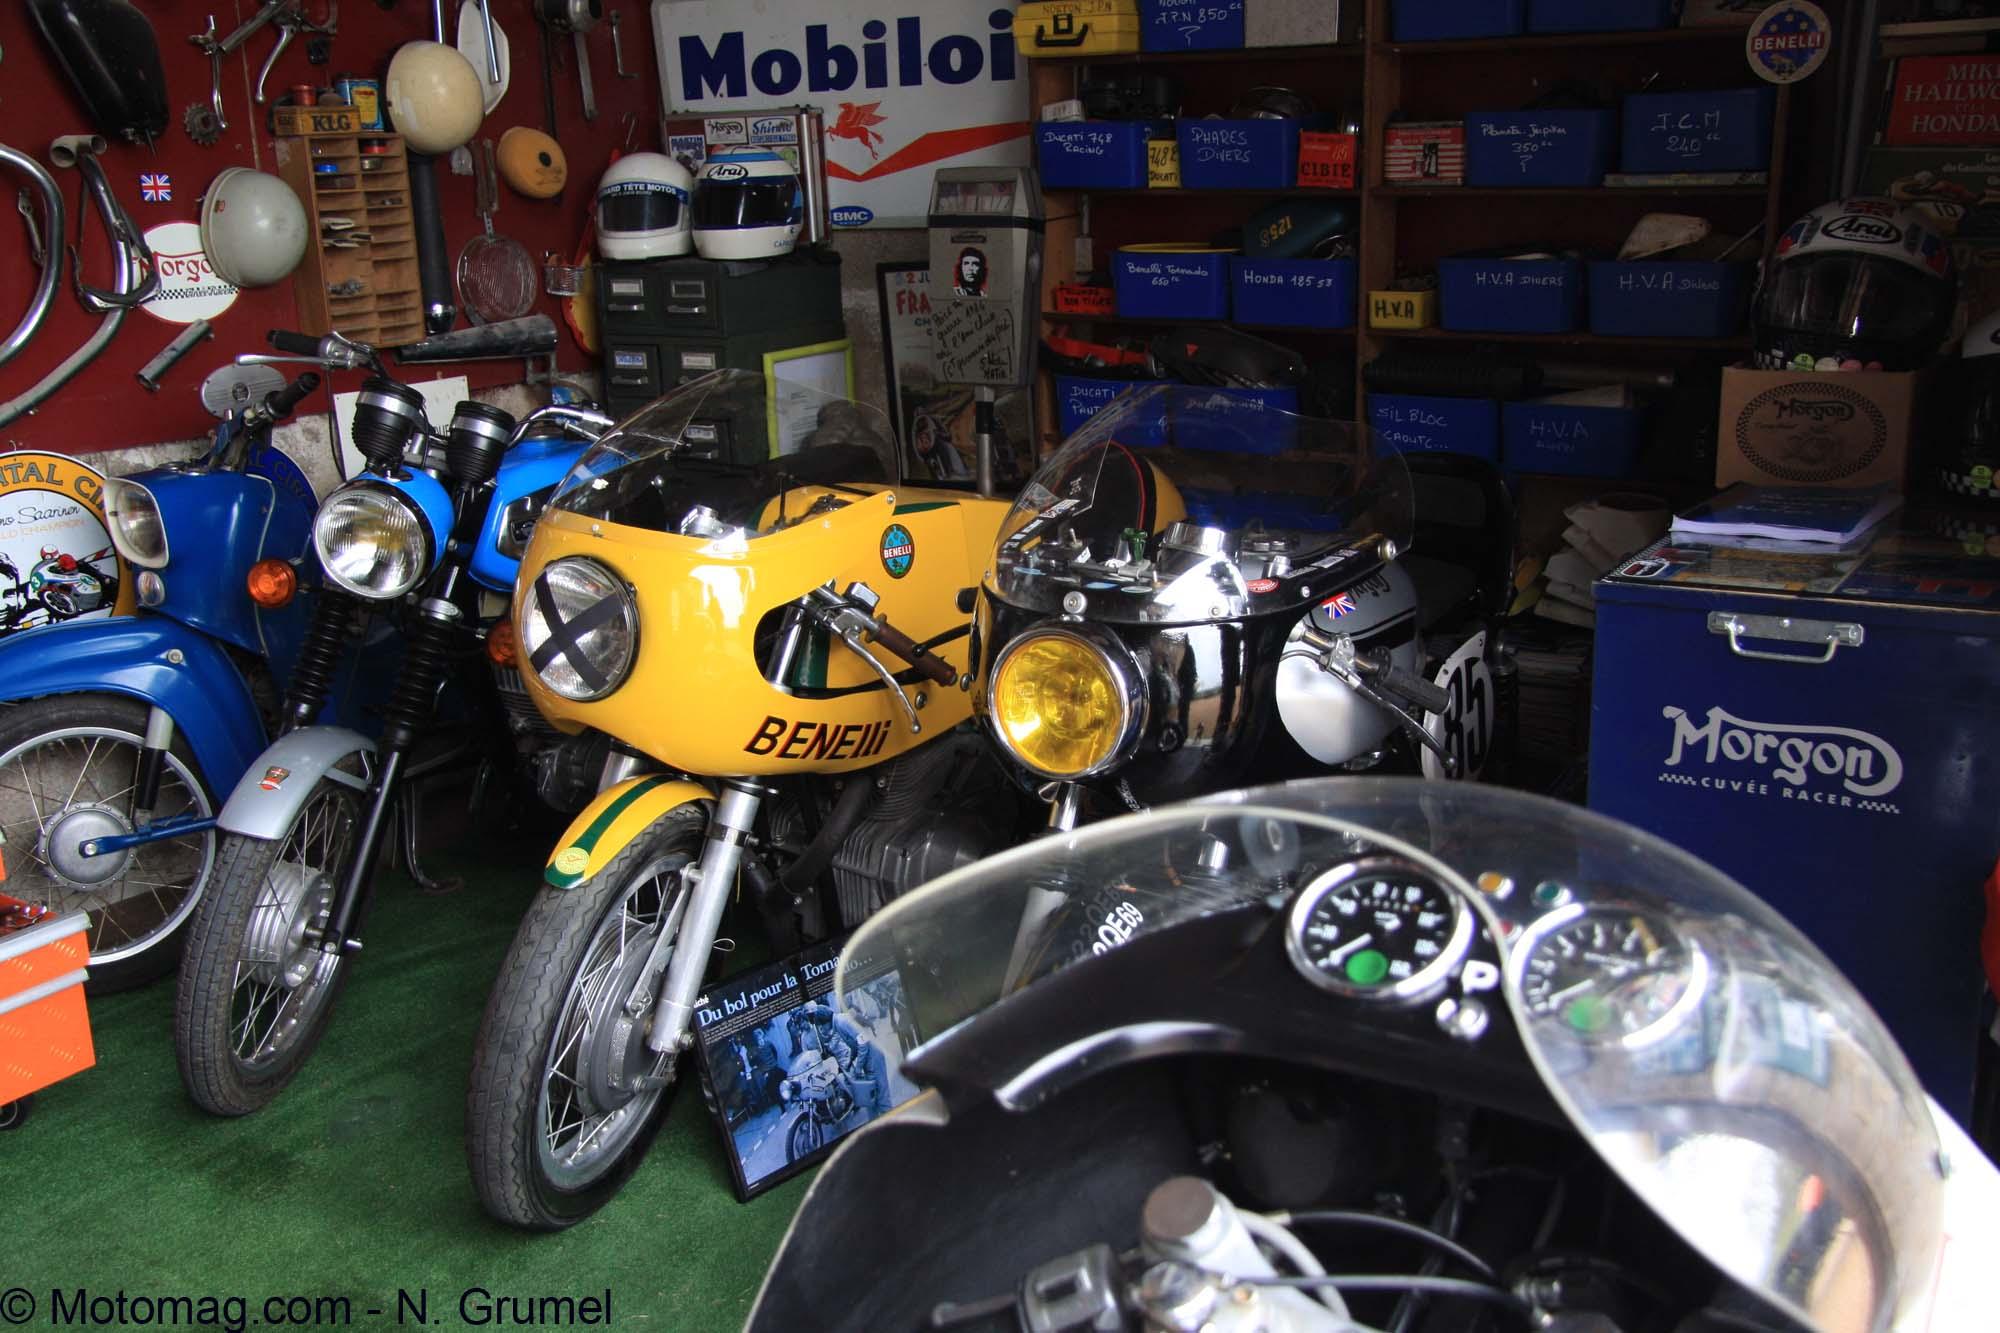 Rencontre motarde